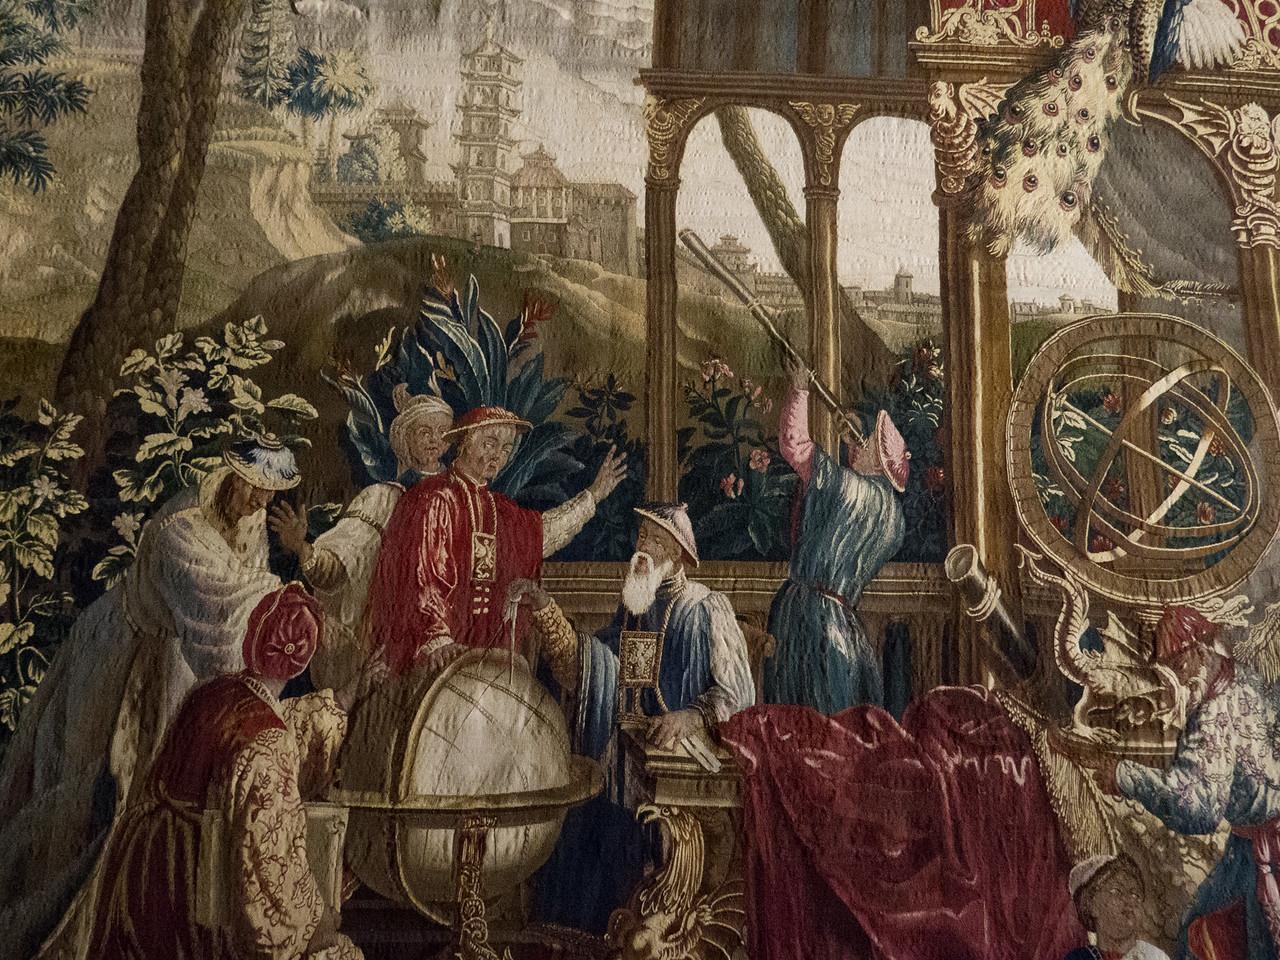 Munich Residence tapestry